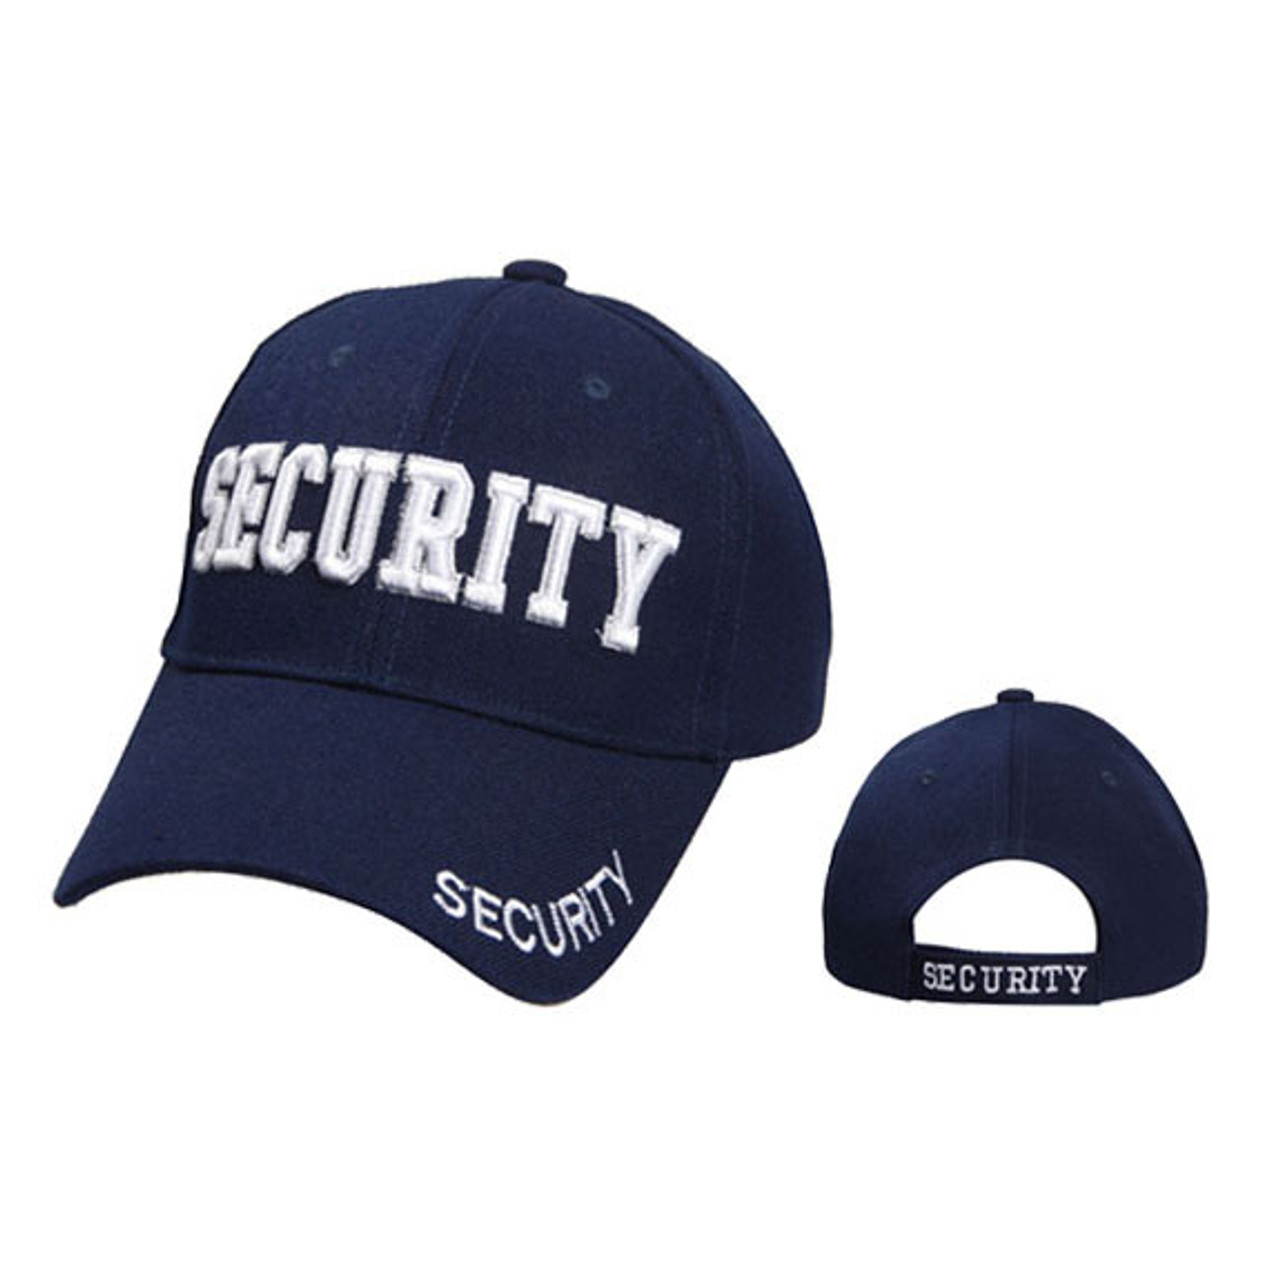 Wholesale Baseball Cap | Security | Navy Blue